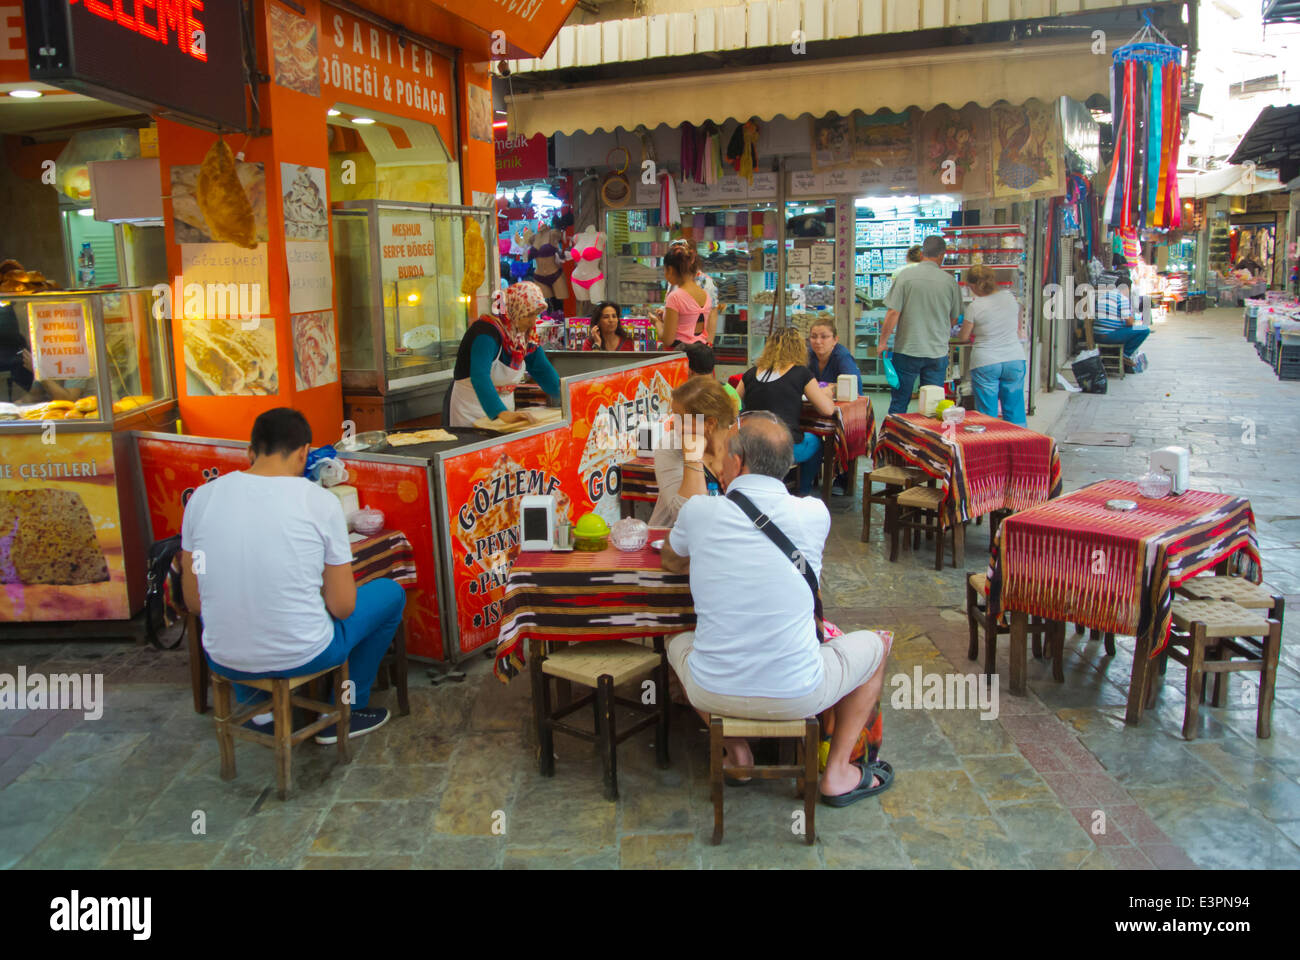 Tea room terrace, Kemeralti bazaar district, central, Izmir, Turkey, Asia Minor - Stock Image